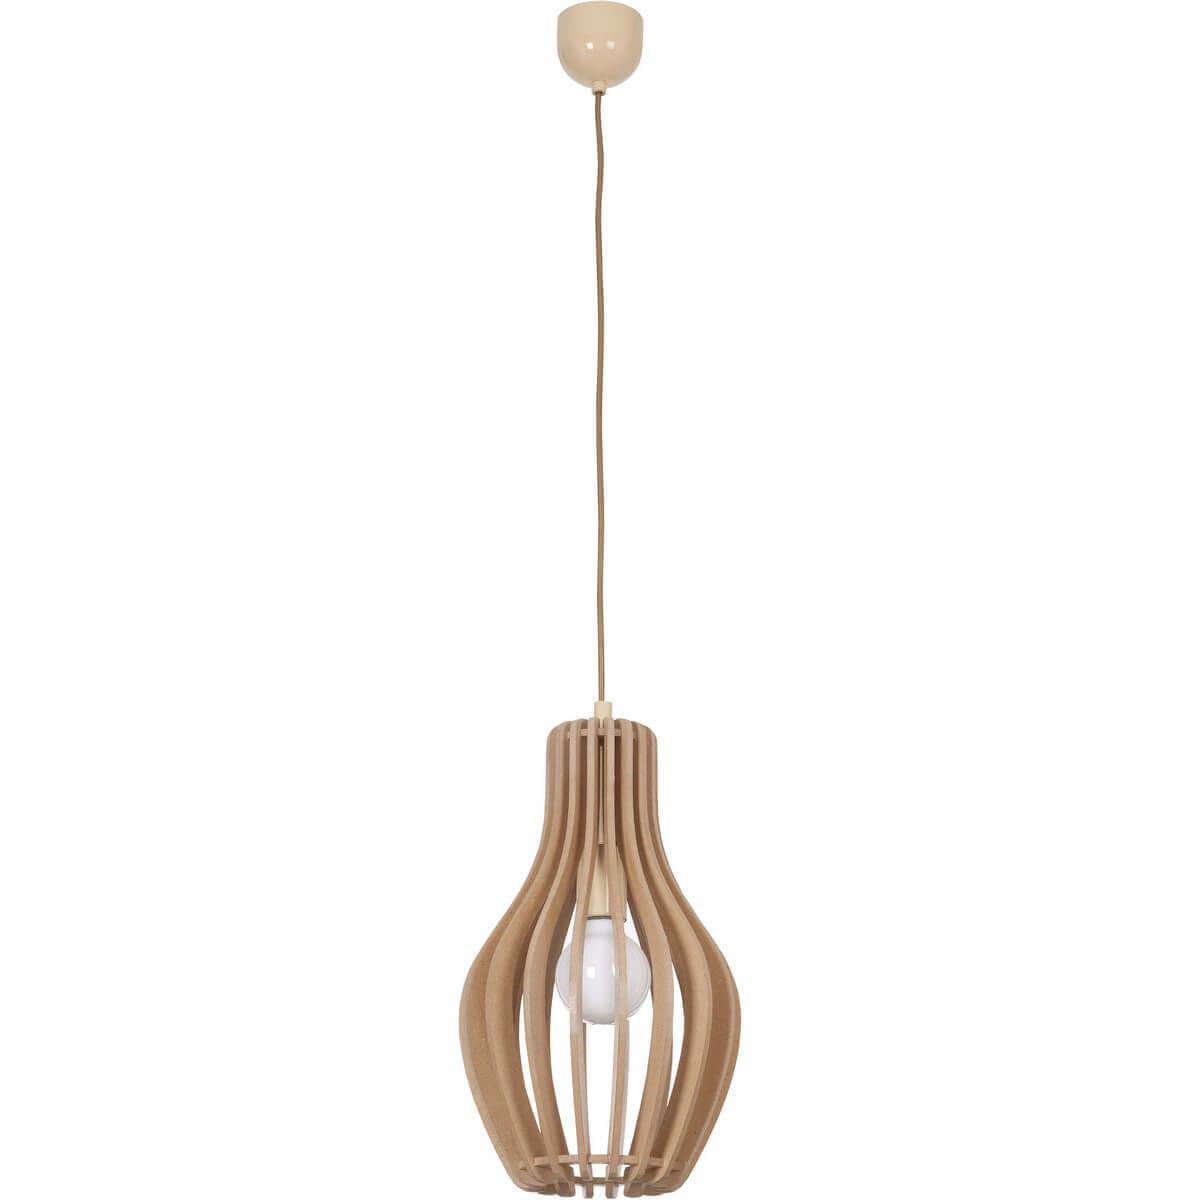 цена на Подвесной светильник Nowodvorski Ika 4171